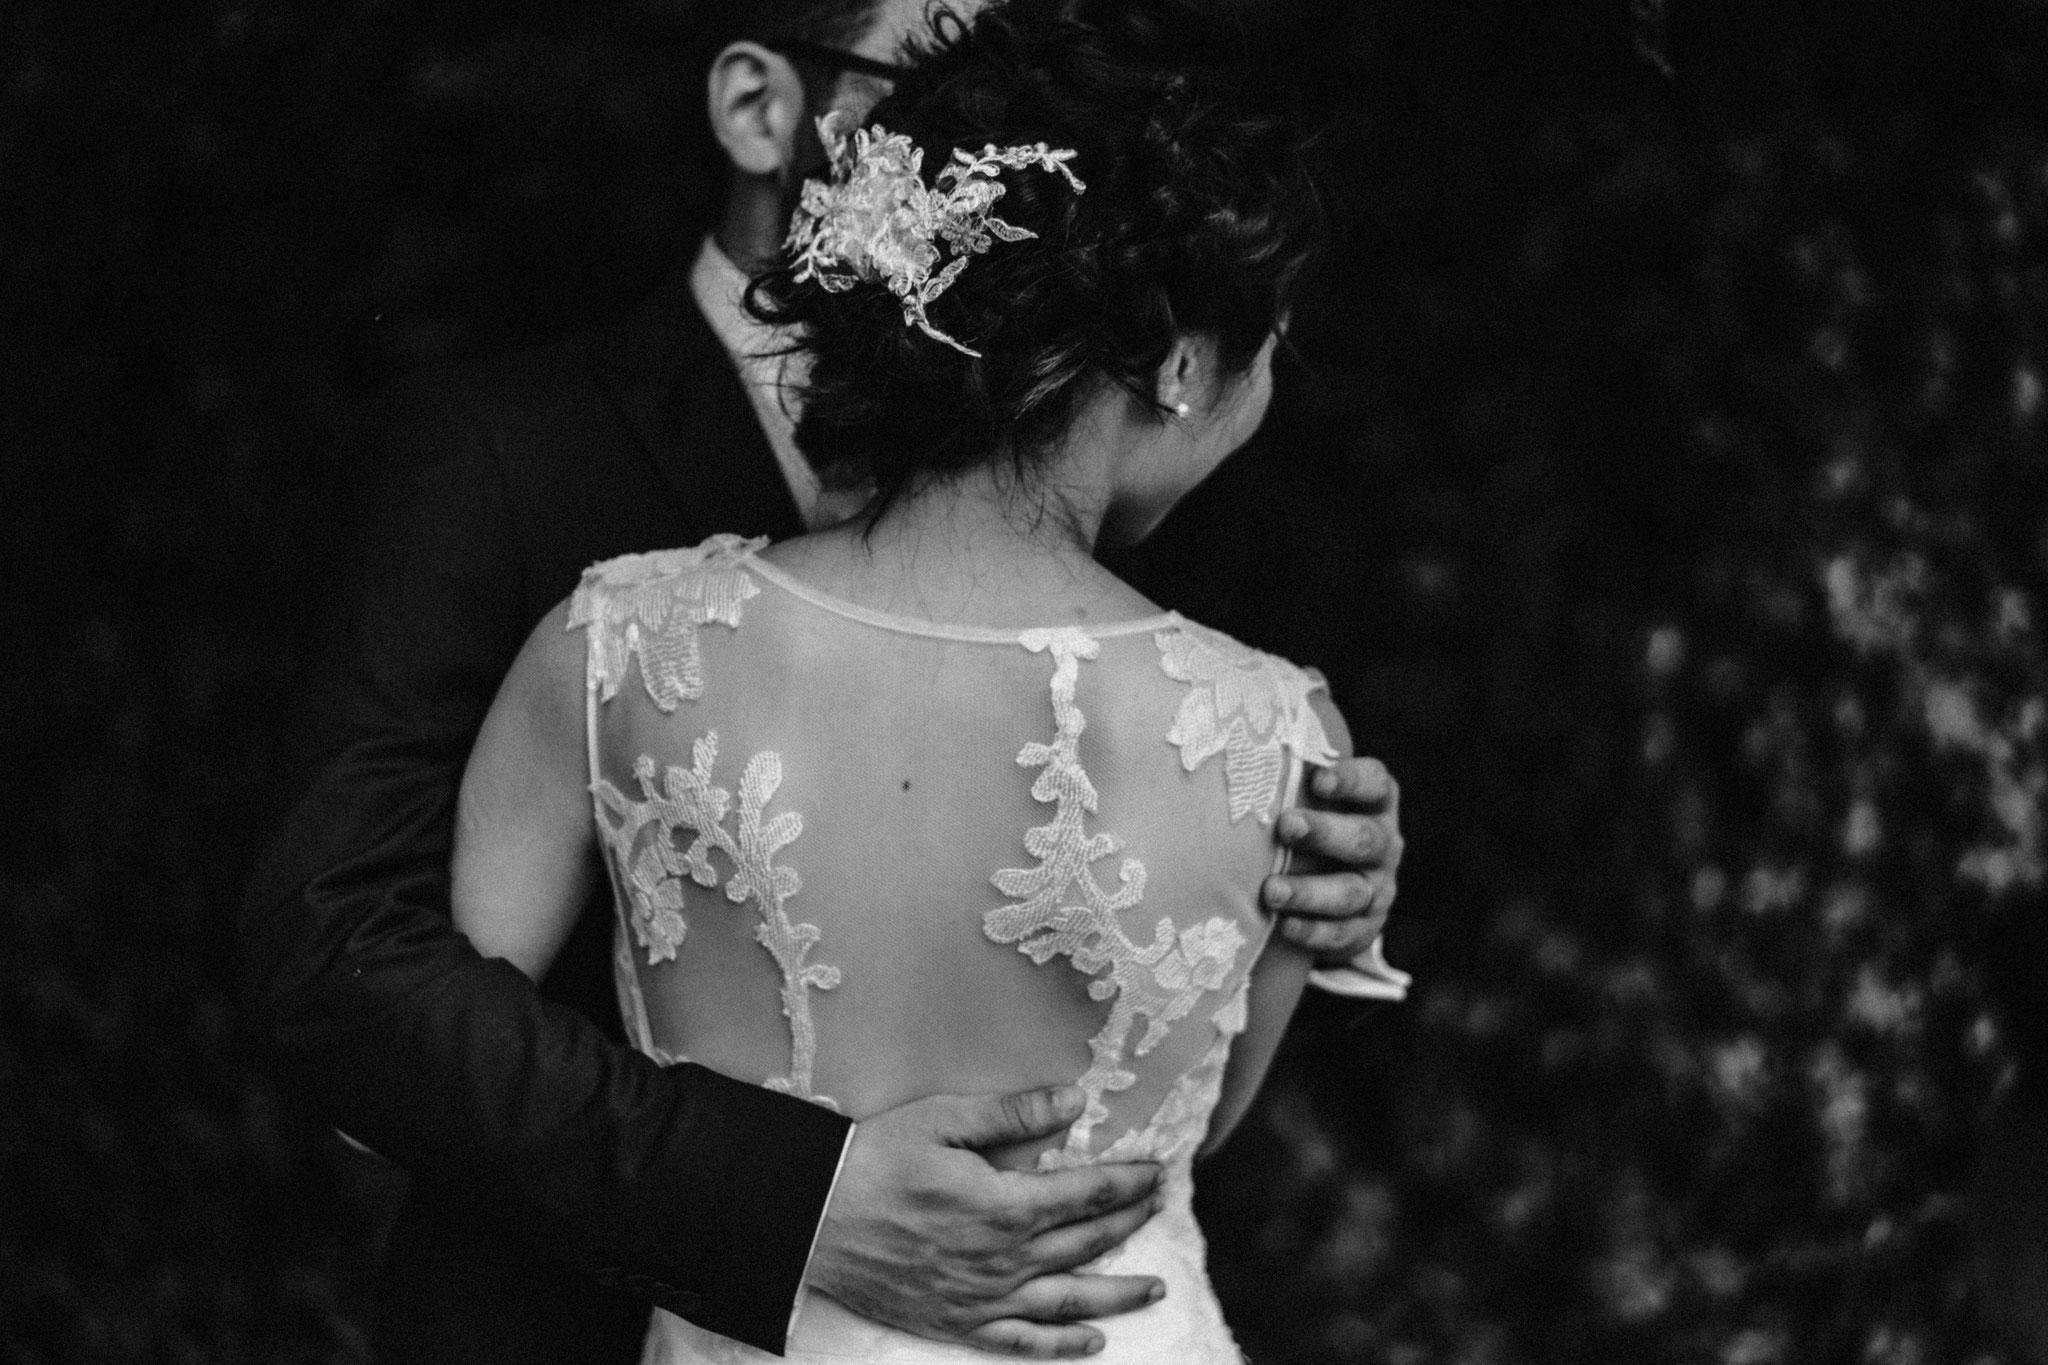 umbria_wedding_photographer_04